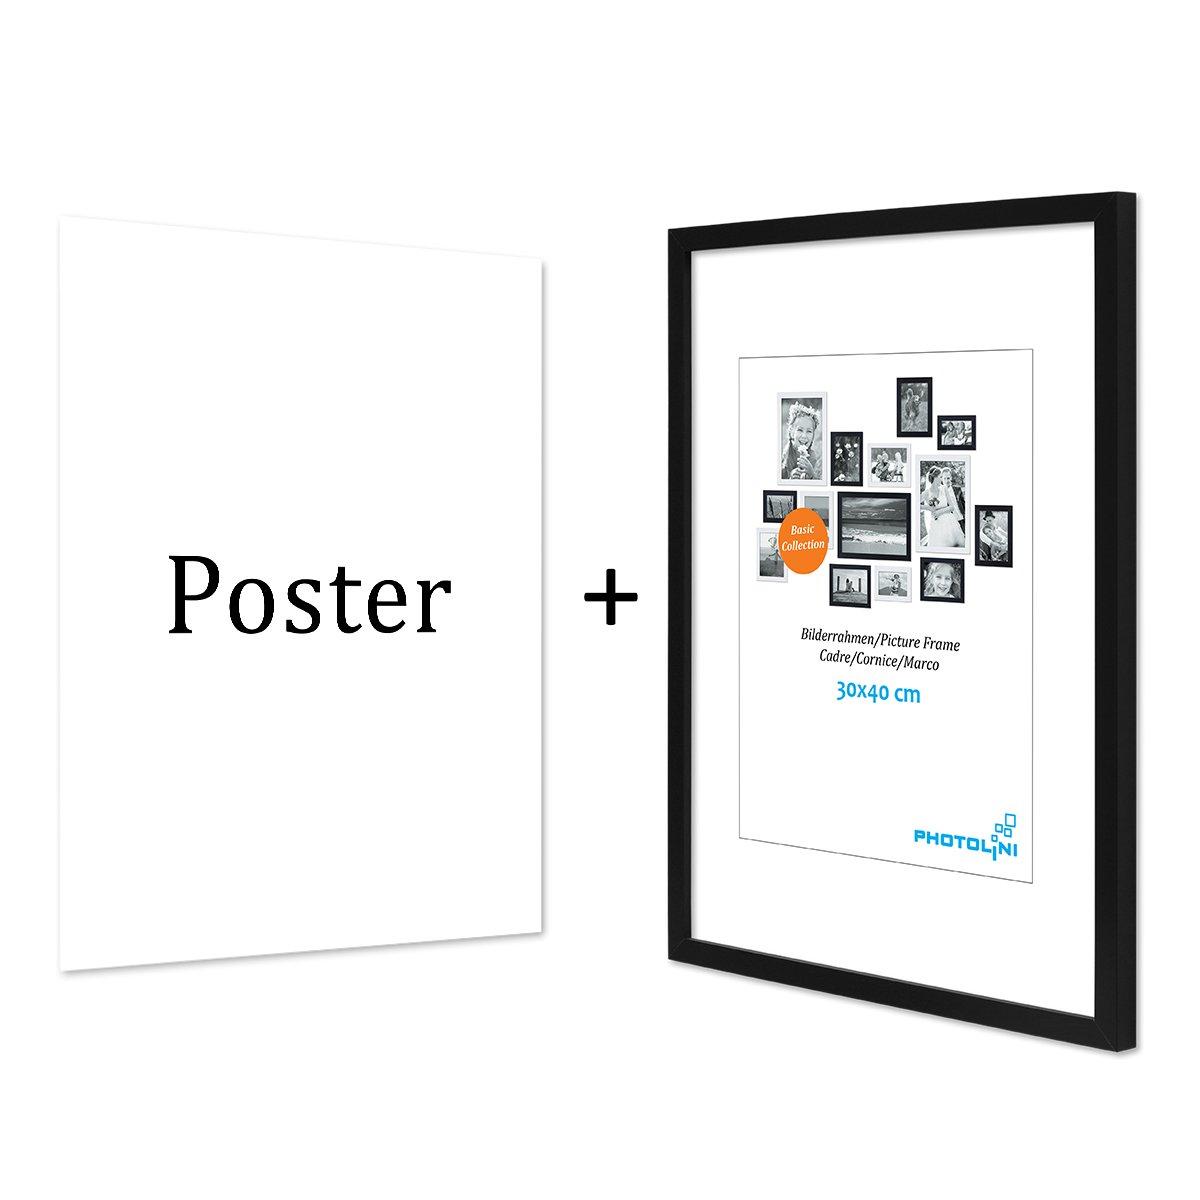 PHOTOLINI Design-Poster mit Bilderrahmen Schwarz \'Hello Gold\' 30x40 ...